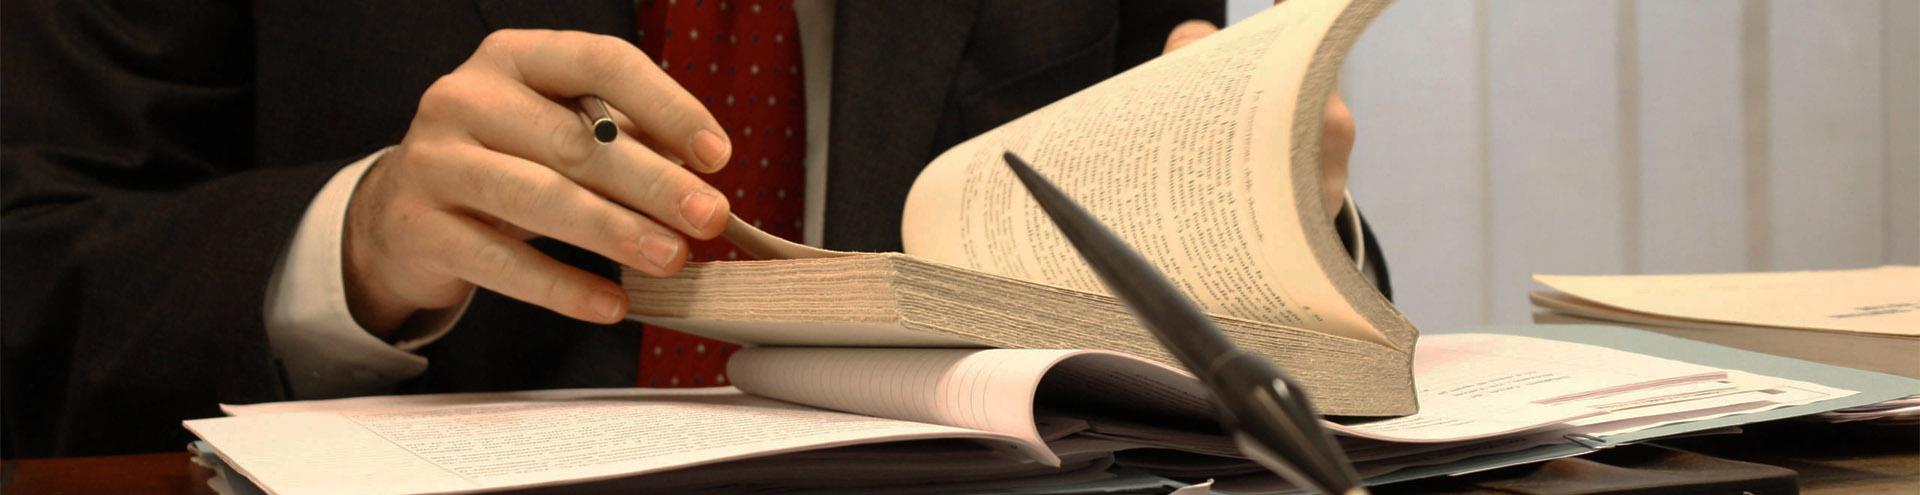 юридические услуги в Ярославле